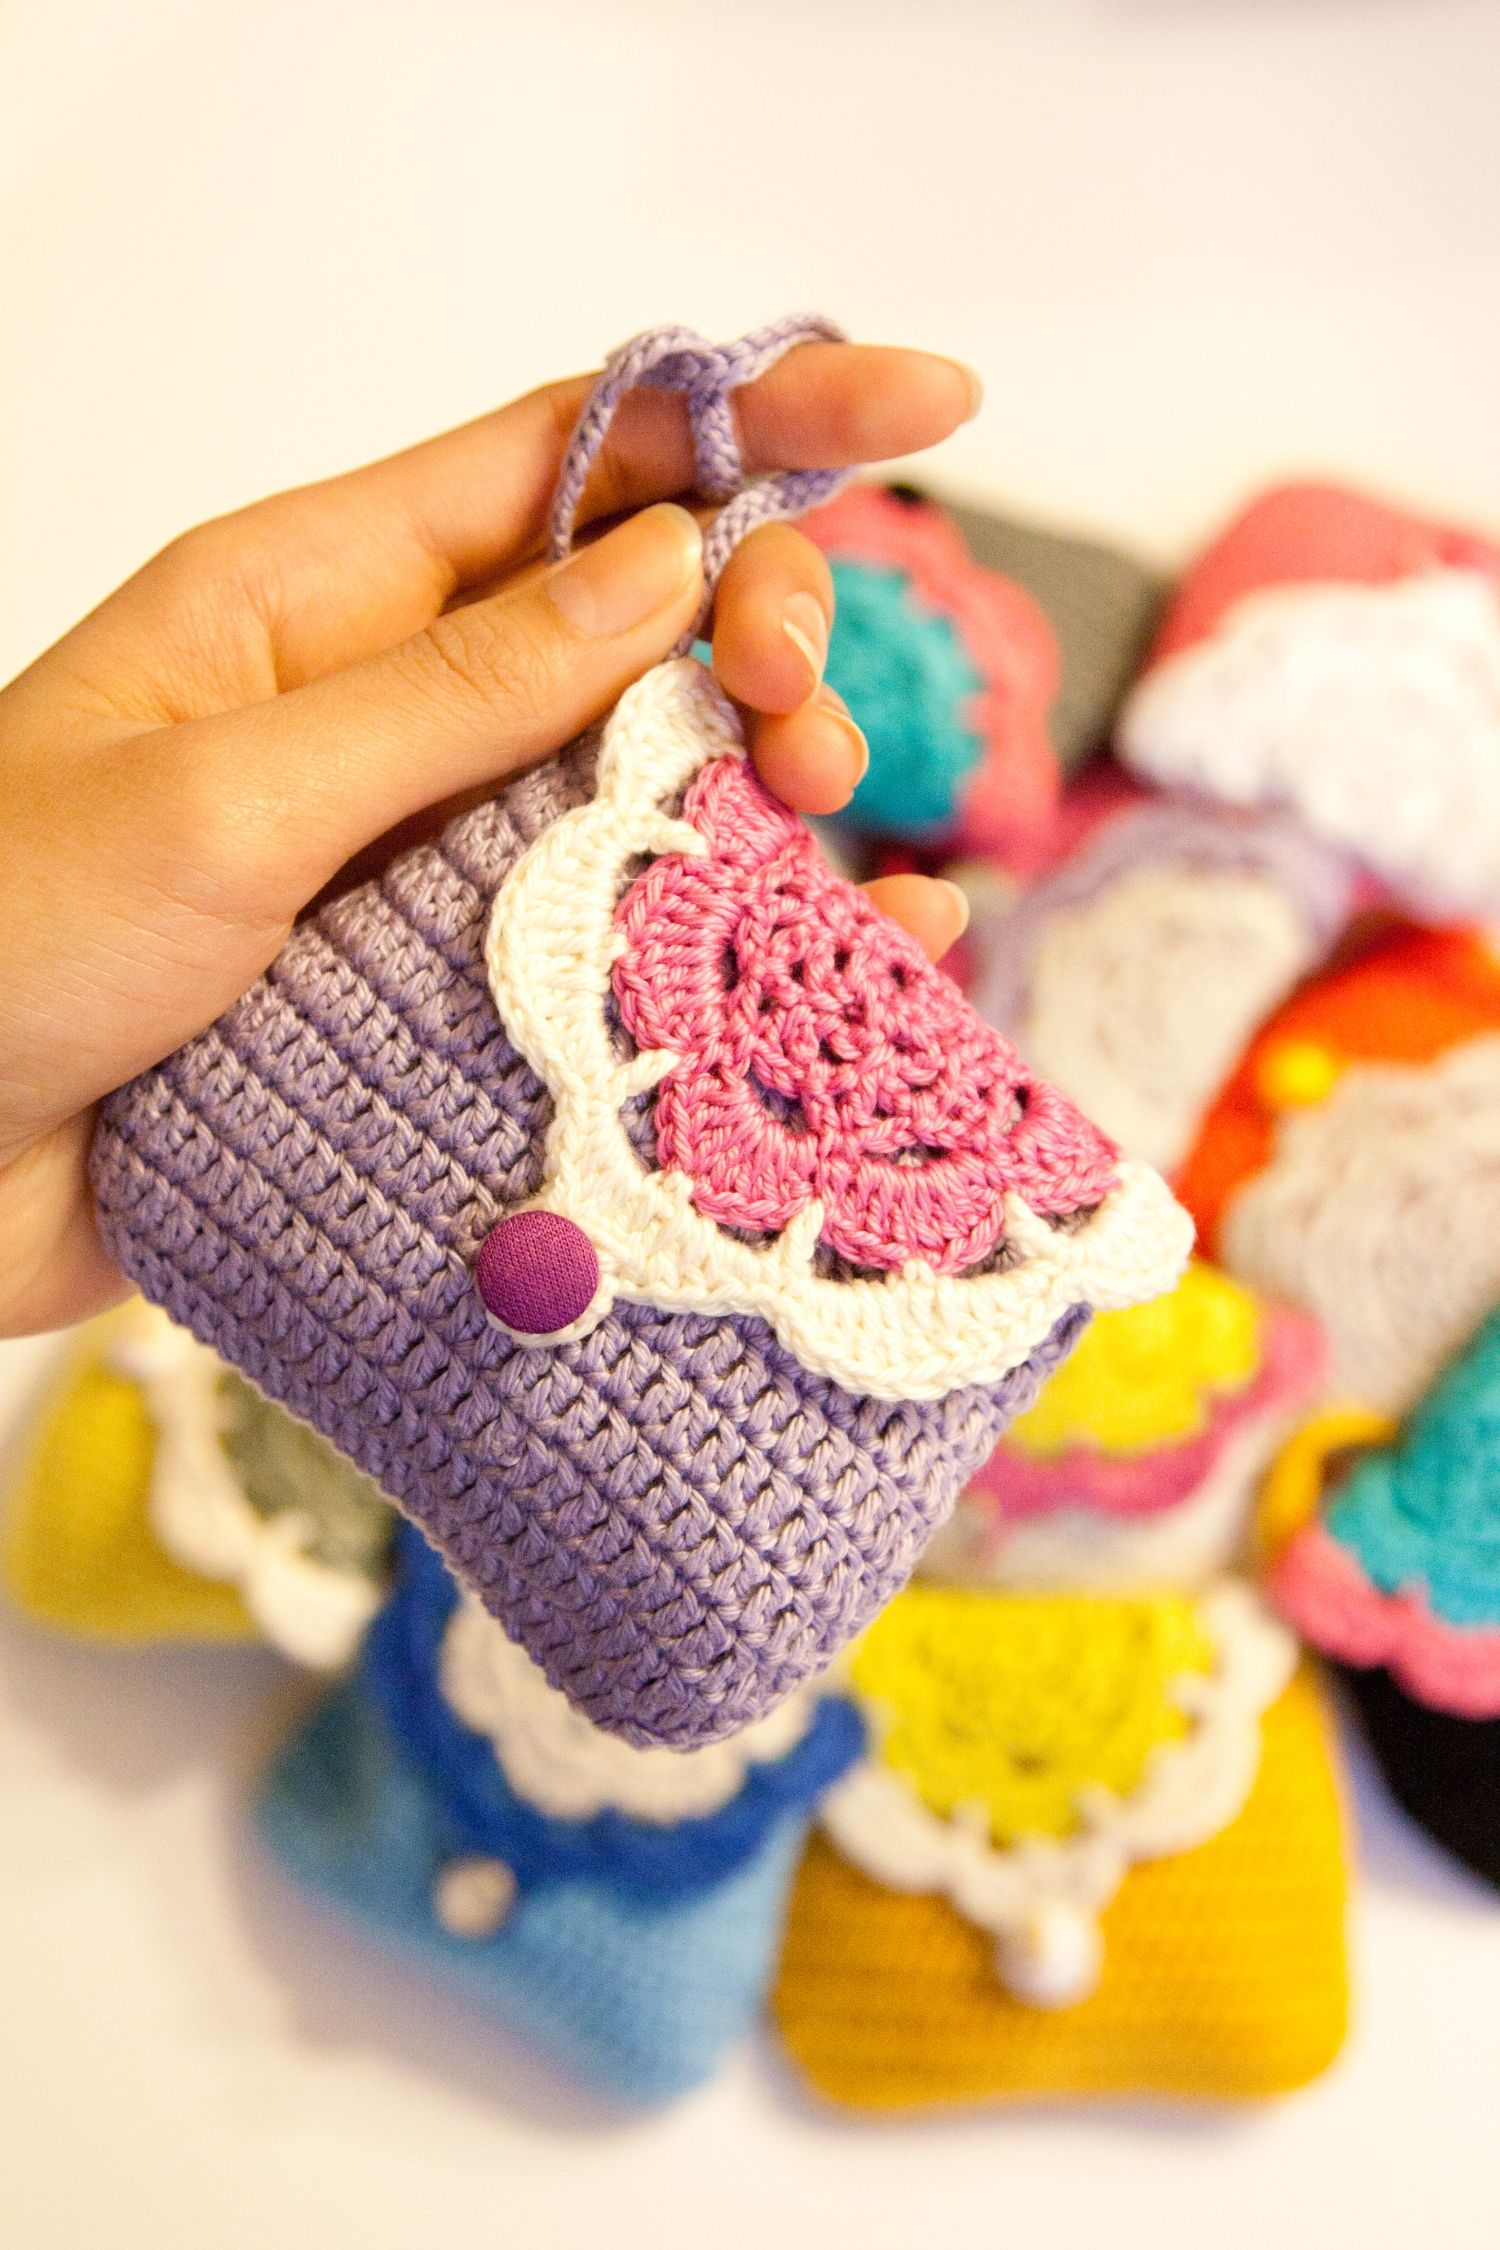 Sweet purse by SweetHandmade